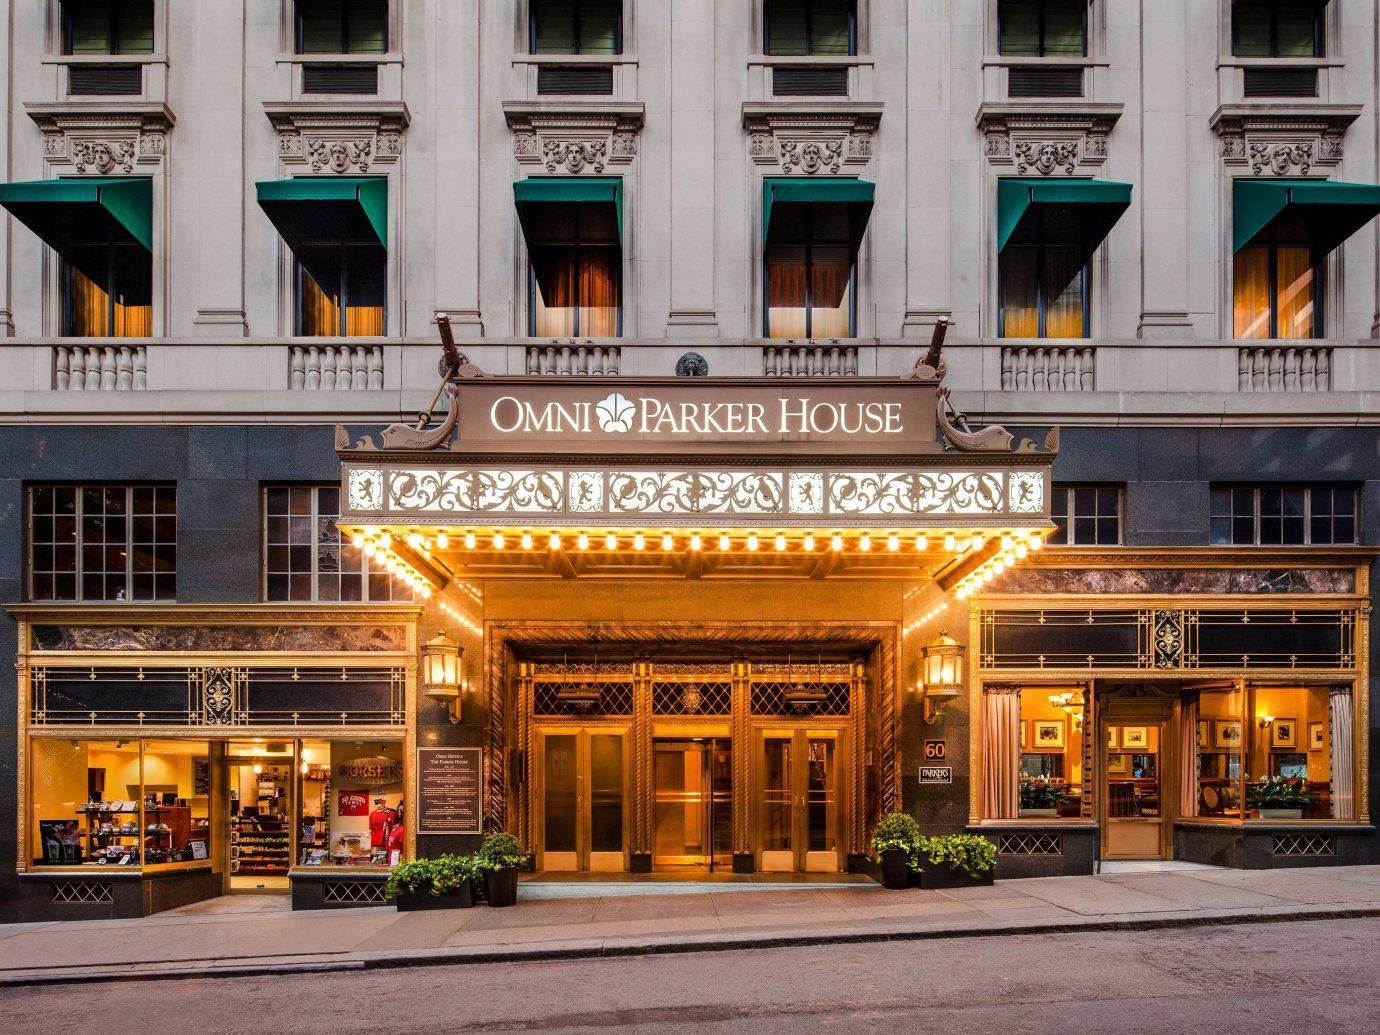 Hotels building outdoor landmark yellow mixed use City facade Downtown condominium metropolitan area night hotel window street